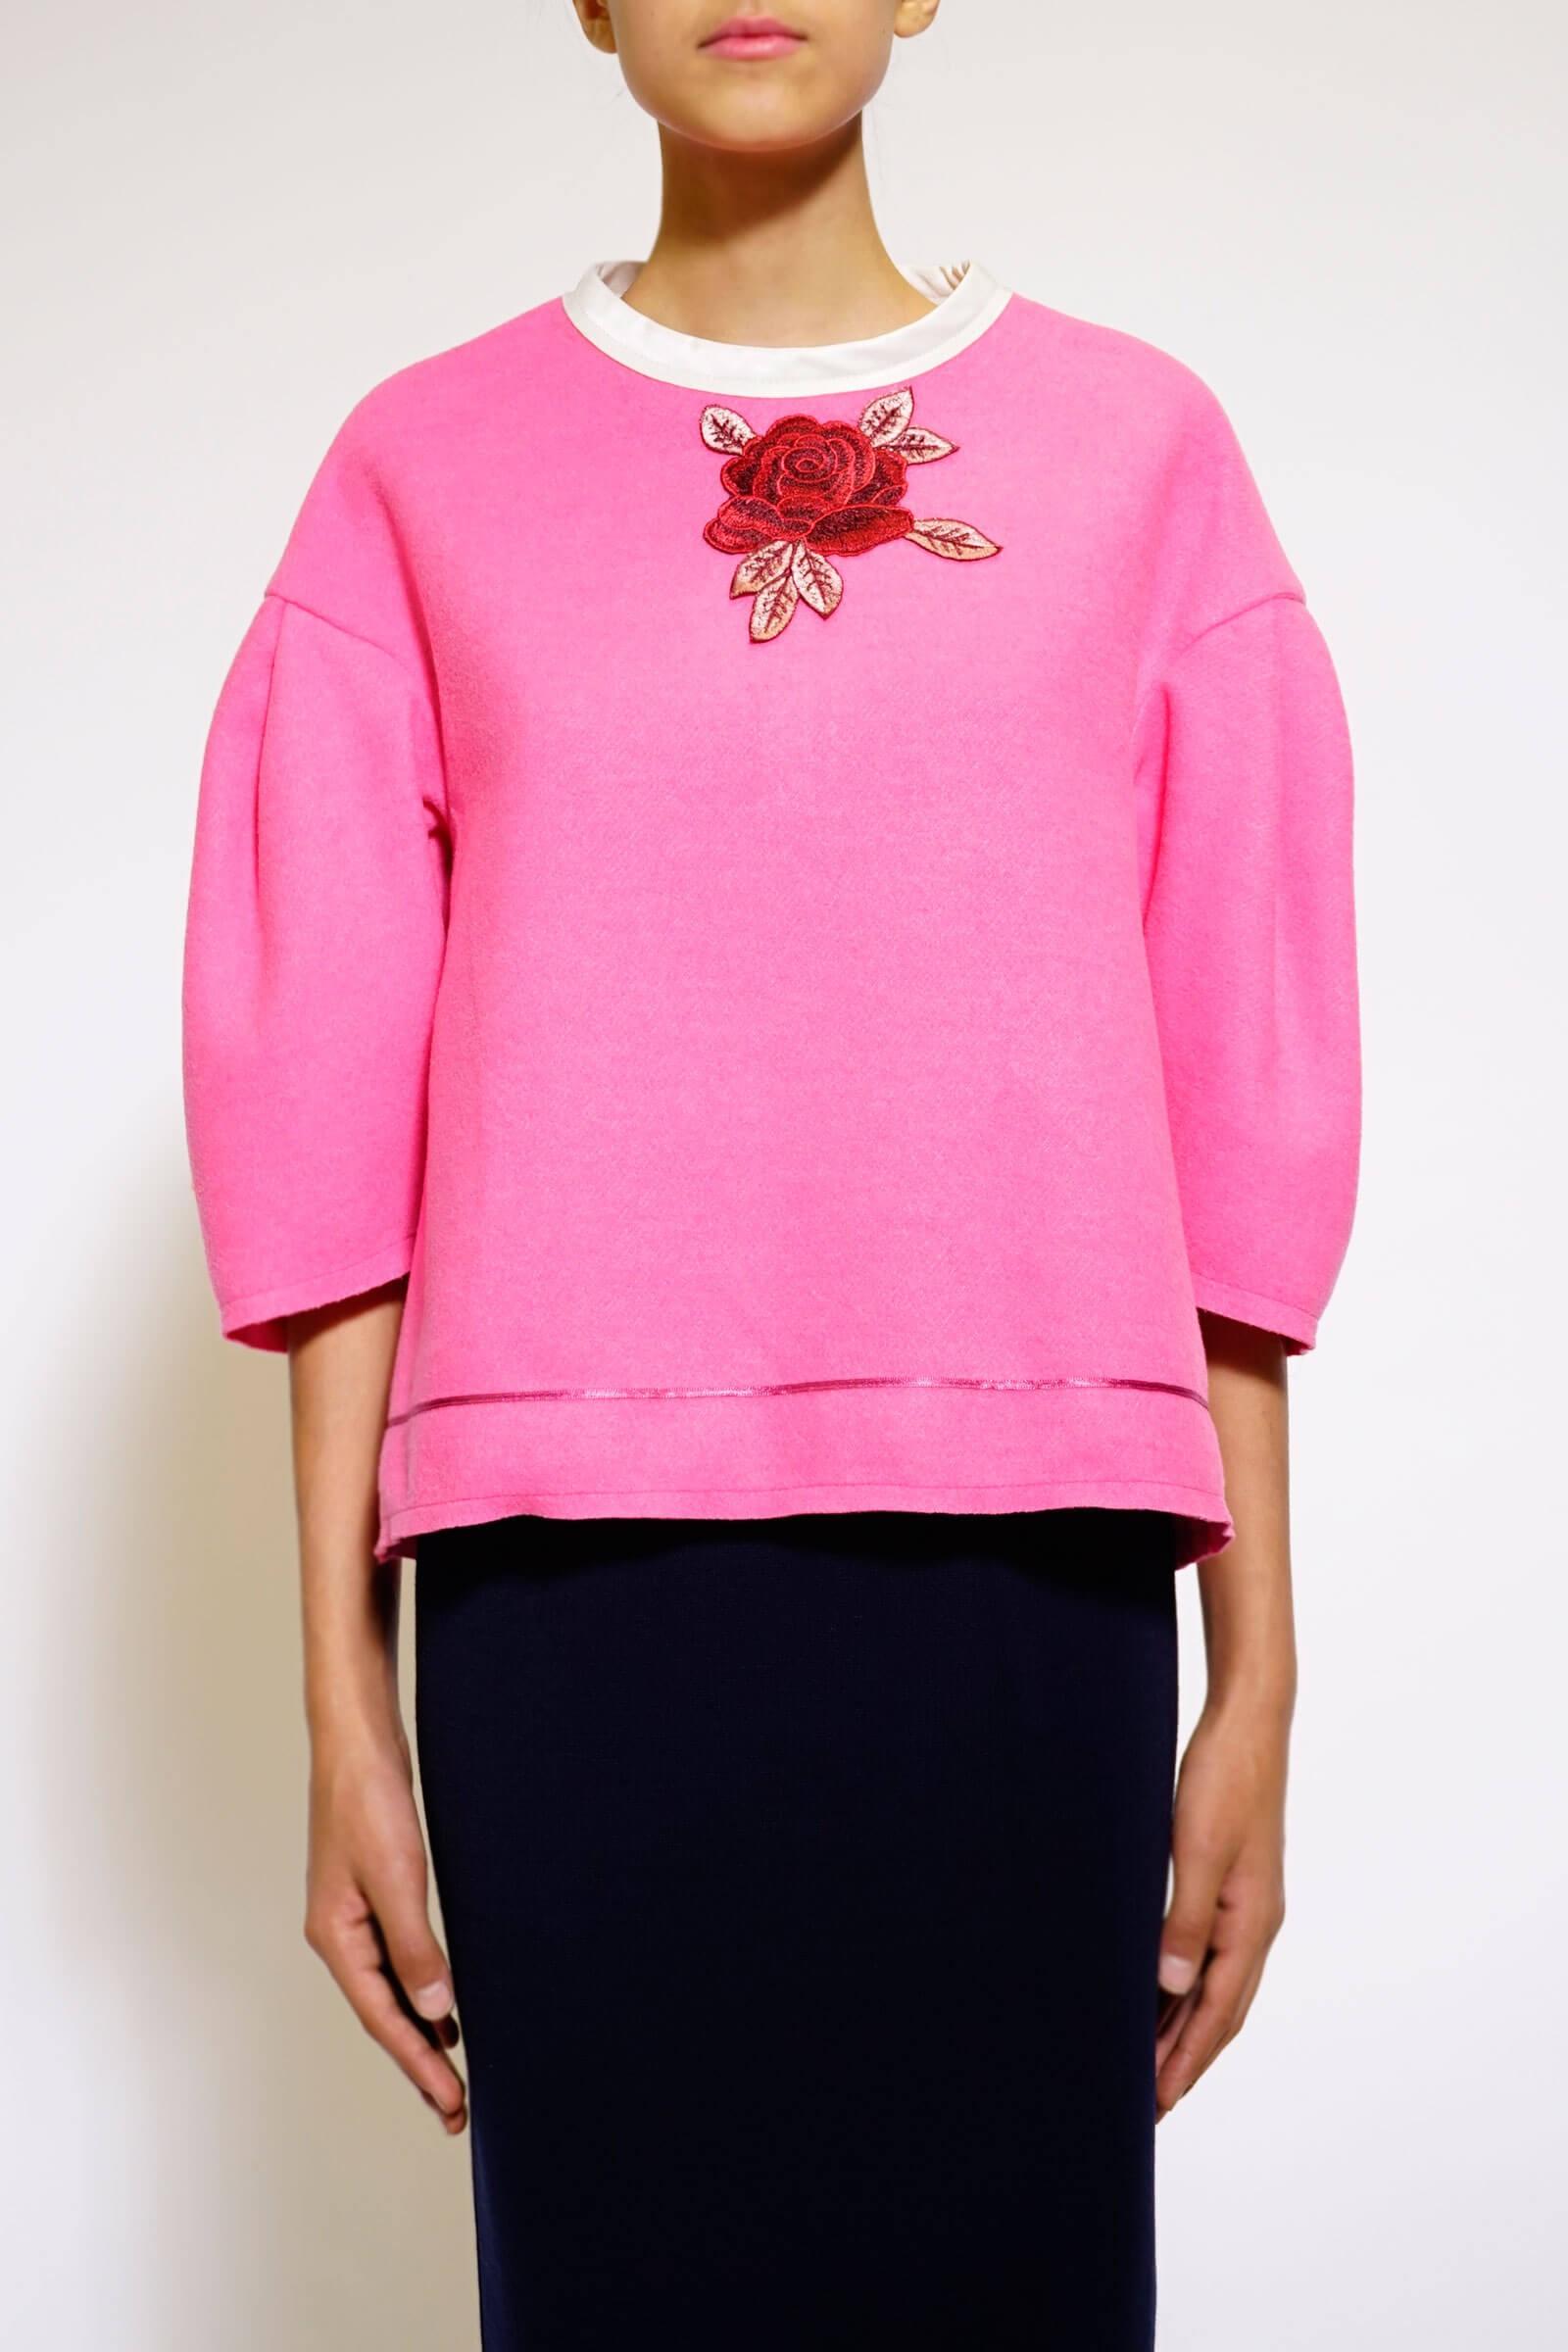 Top roz din lana